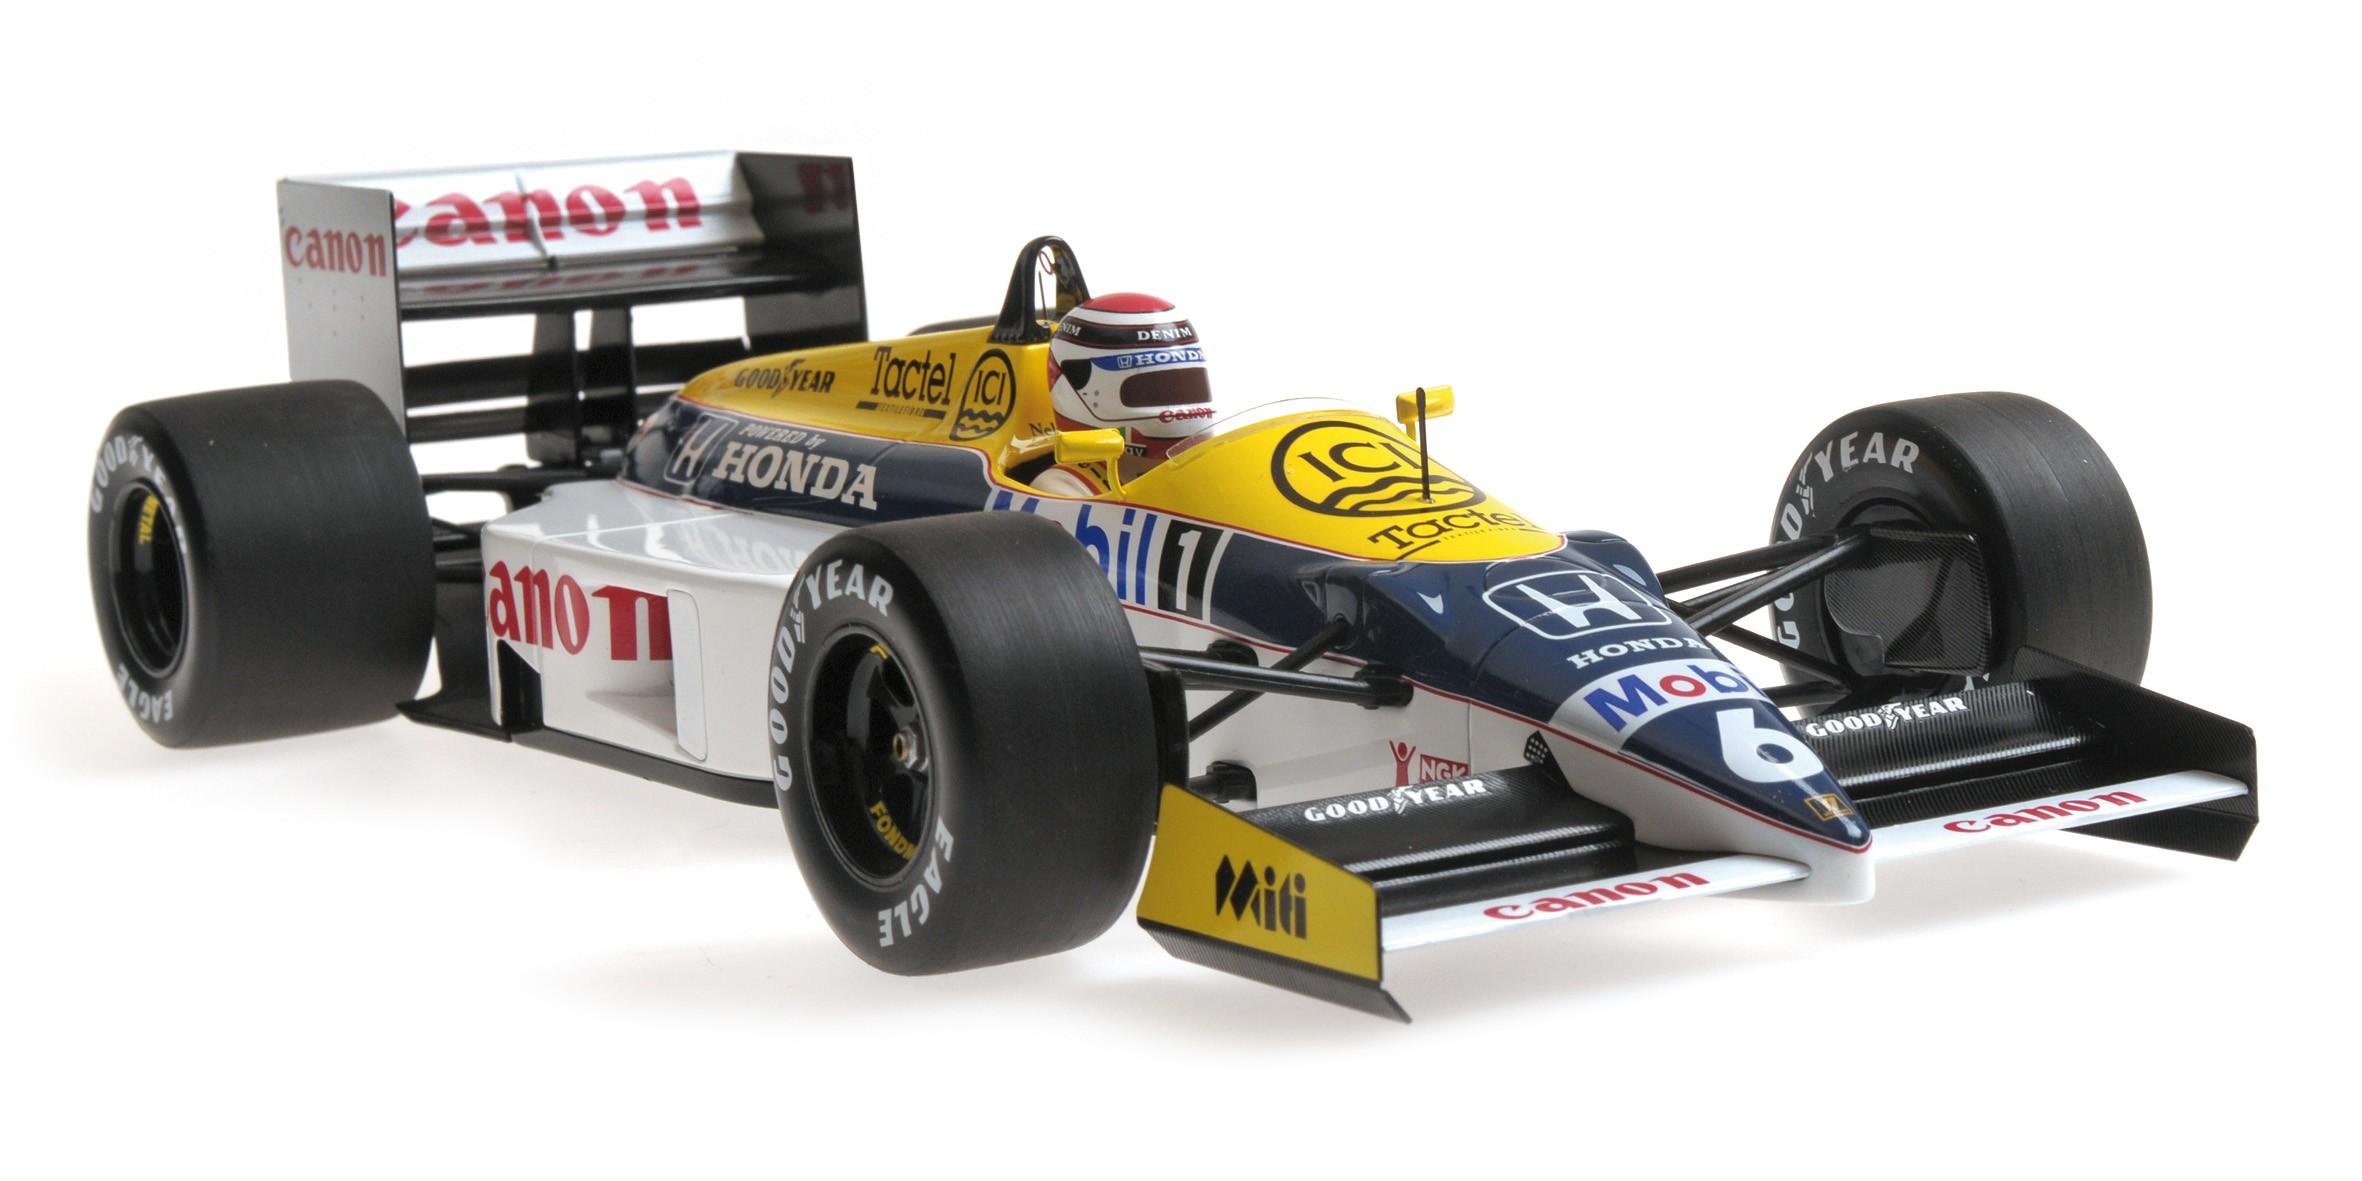 Williams Honda FW11  N.Piquet  1986  Minichamps 1:18  OVP  NEU